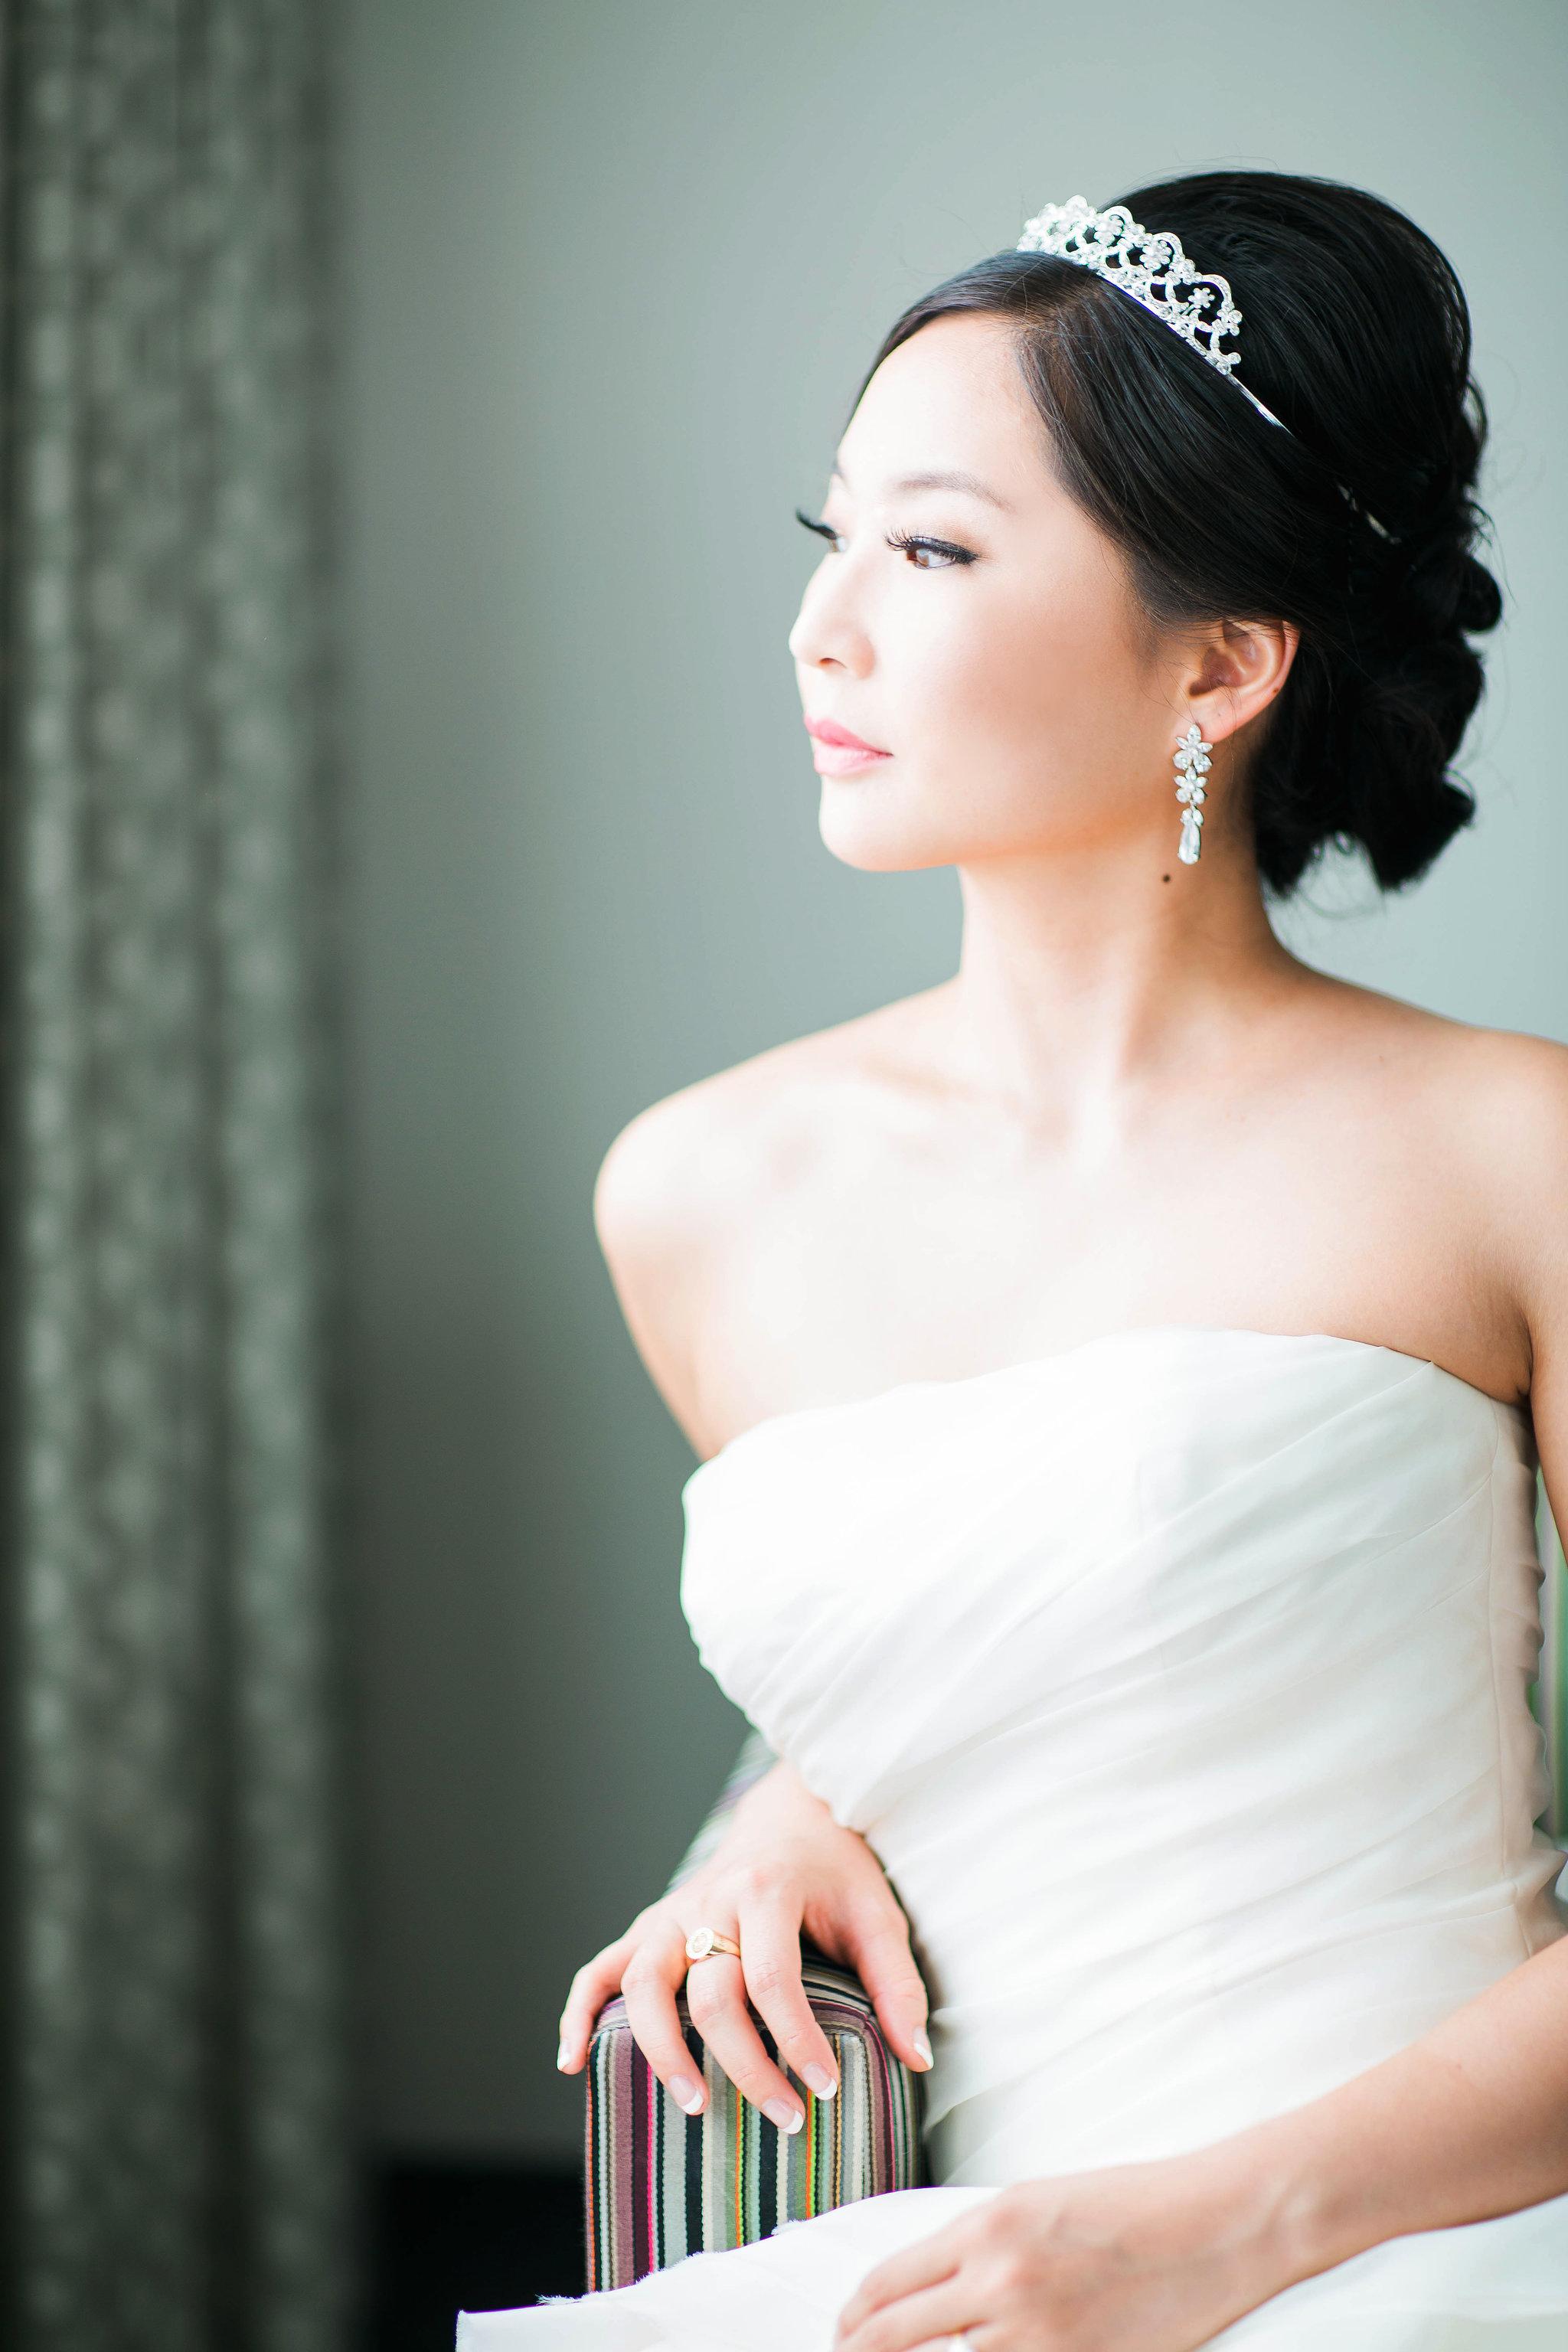 murano-hotel-asian-wedding-tacoma-by-seattle-wedding-photographer-adina-preston-6.jpg